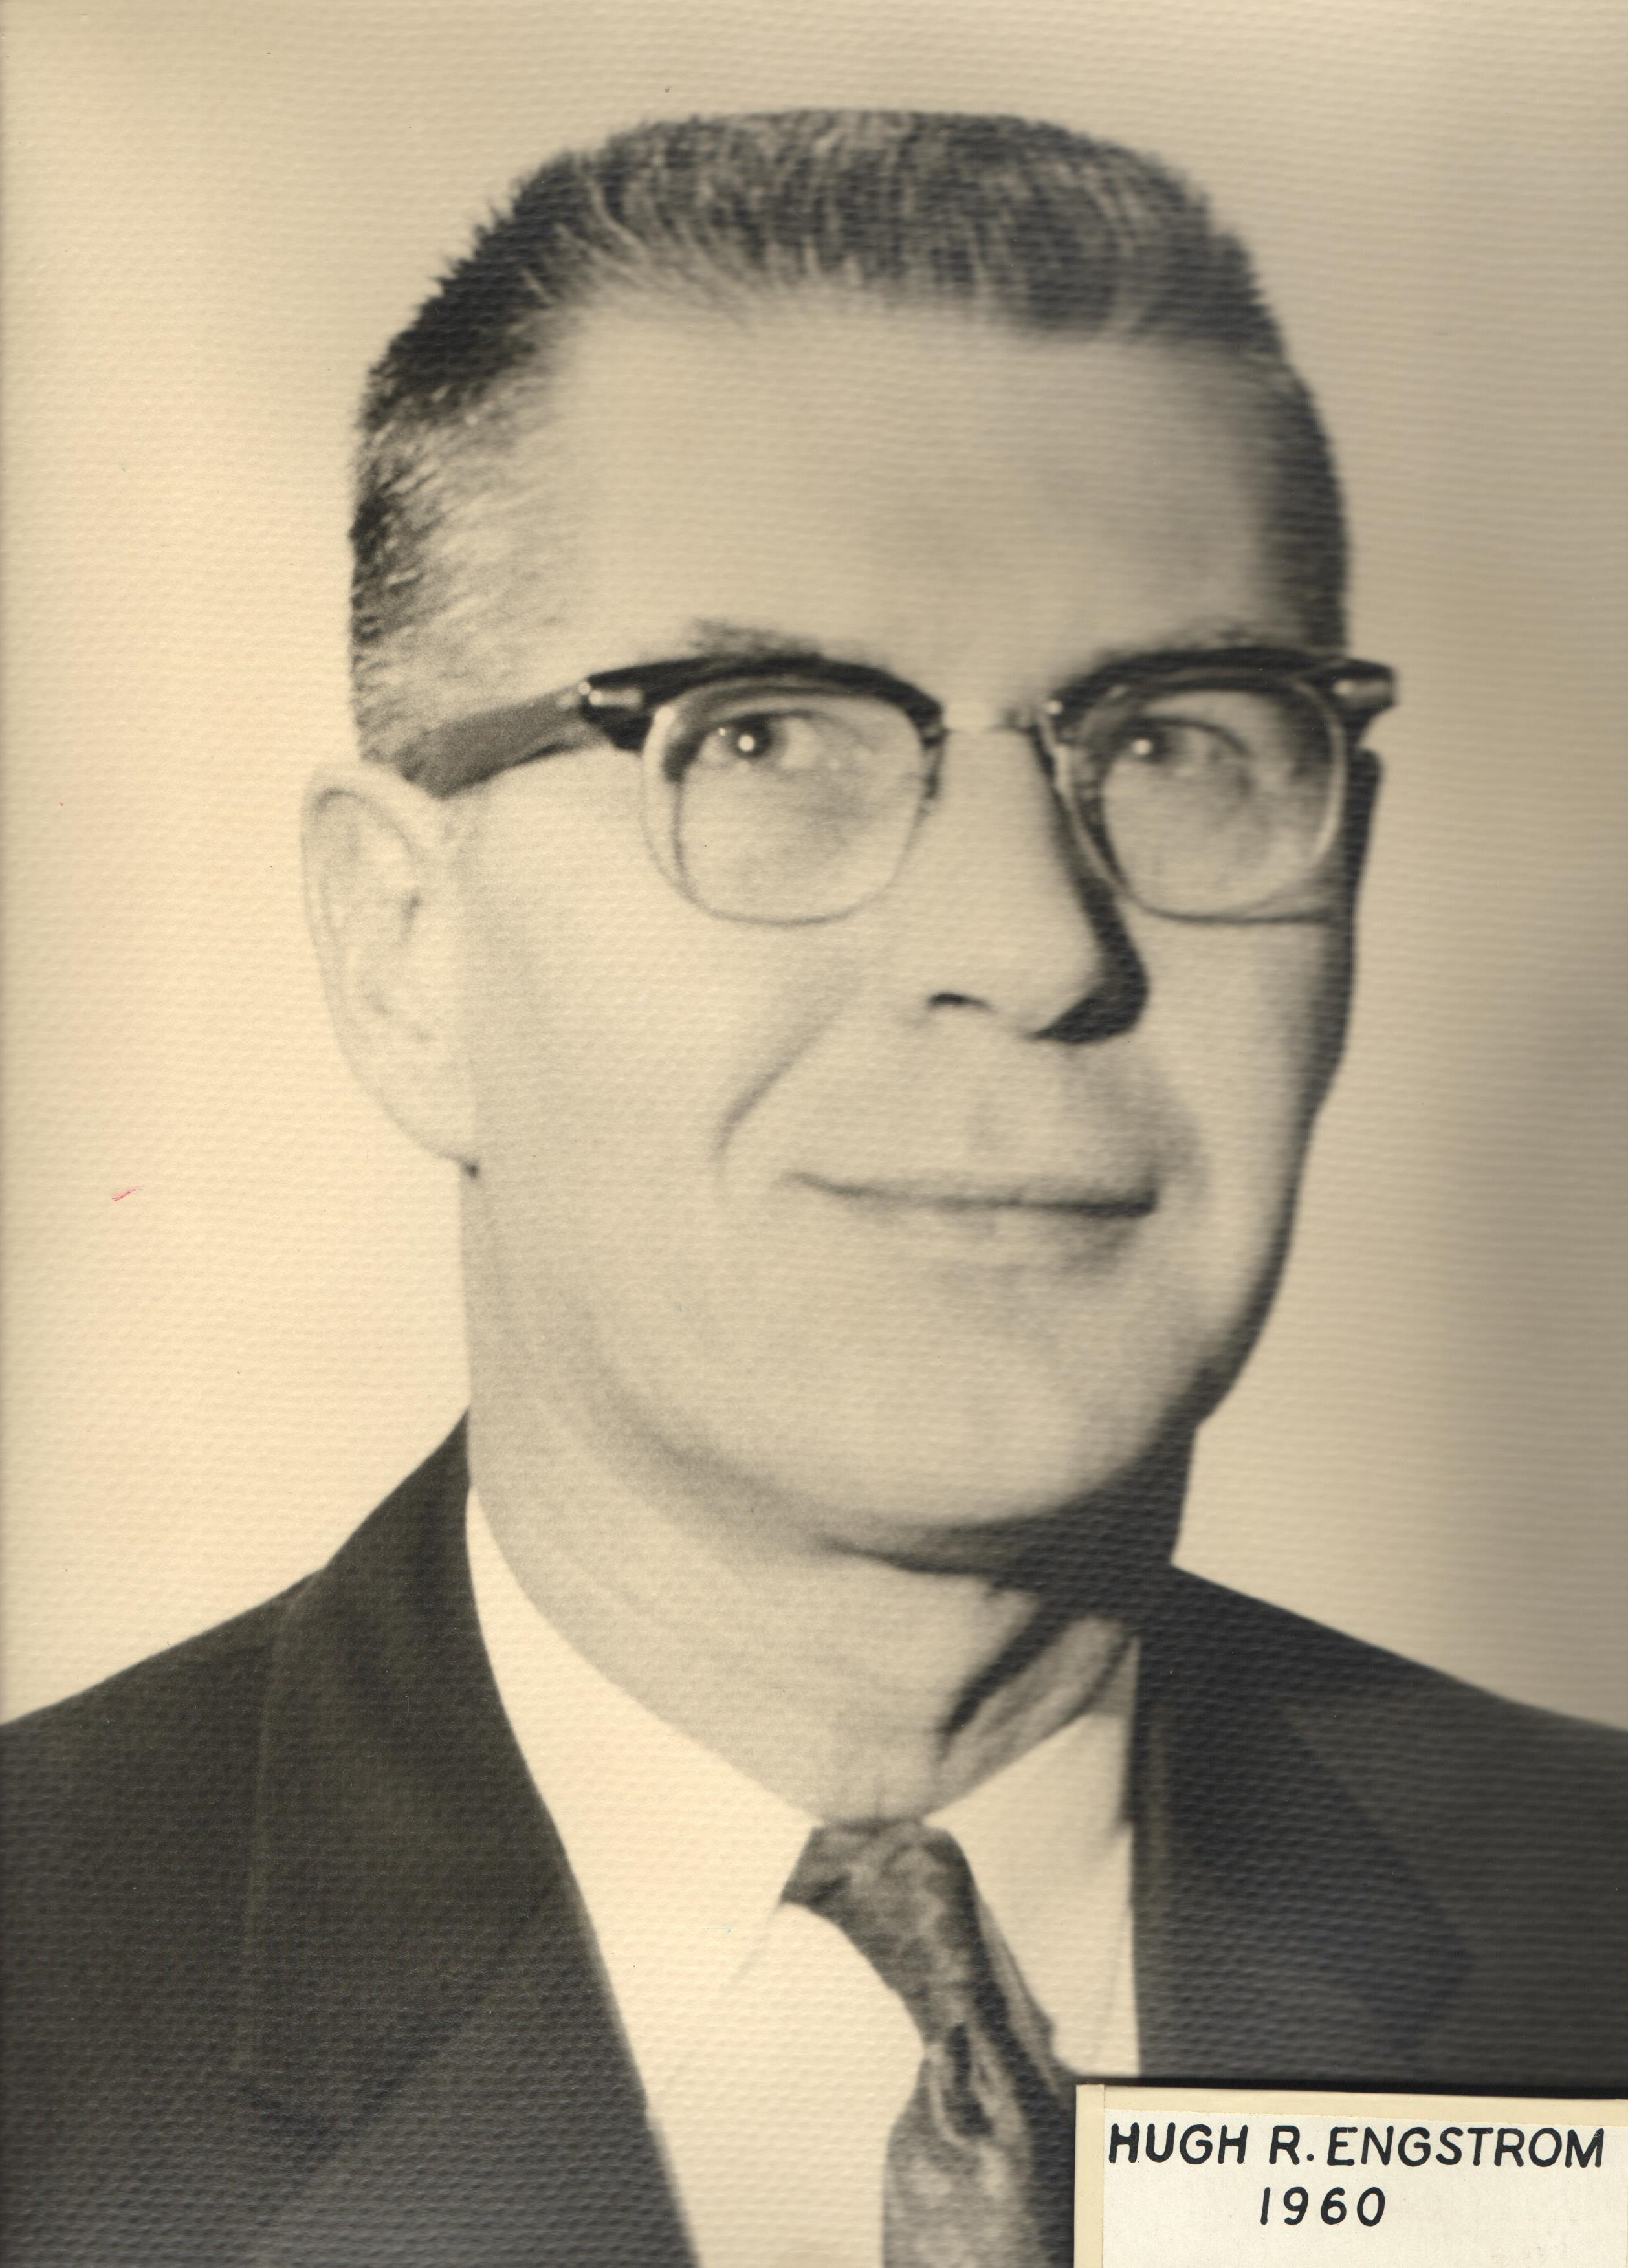 1960 Hugh R. Engstrom